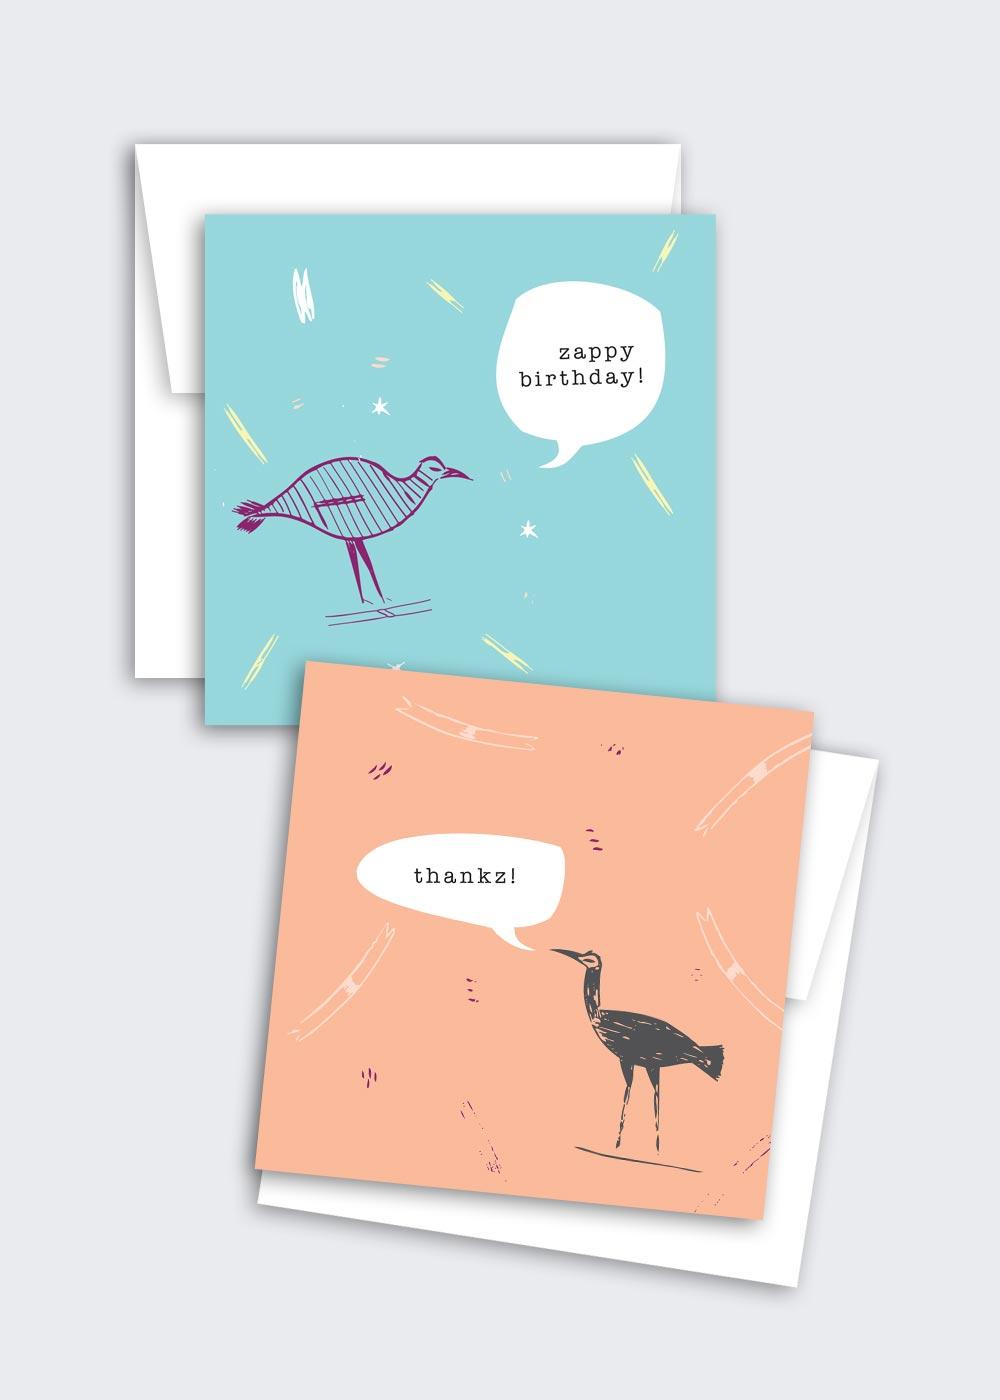 Zinni & Zanni (quirky bird sayz…) – mixed card set (thankz, congratz, zappy birthday, zello or custom)